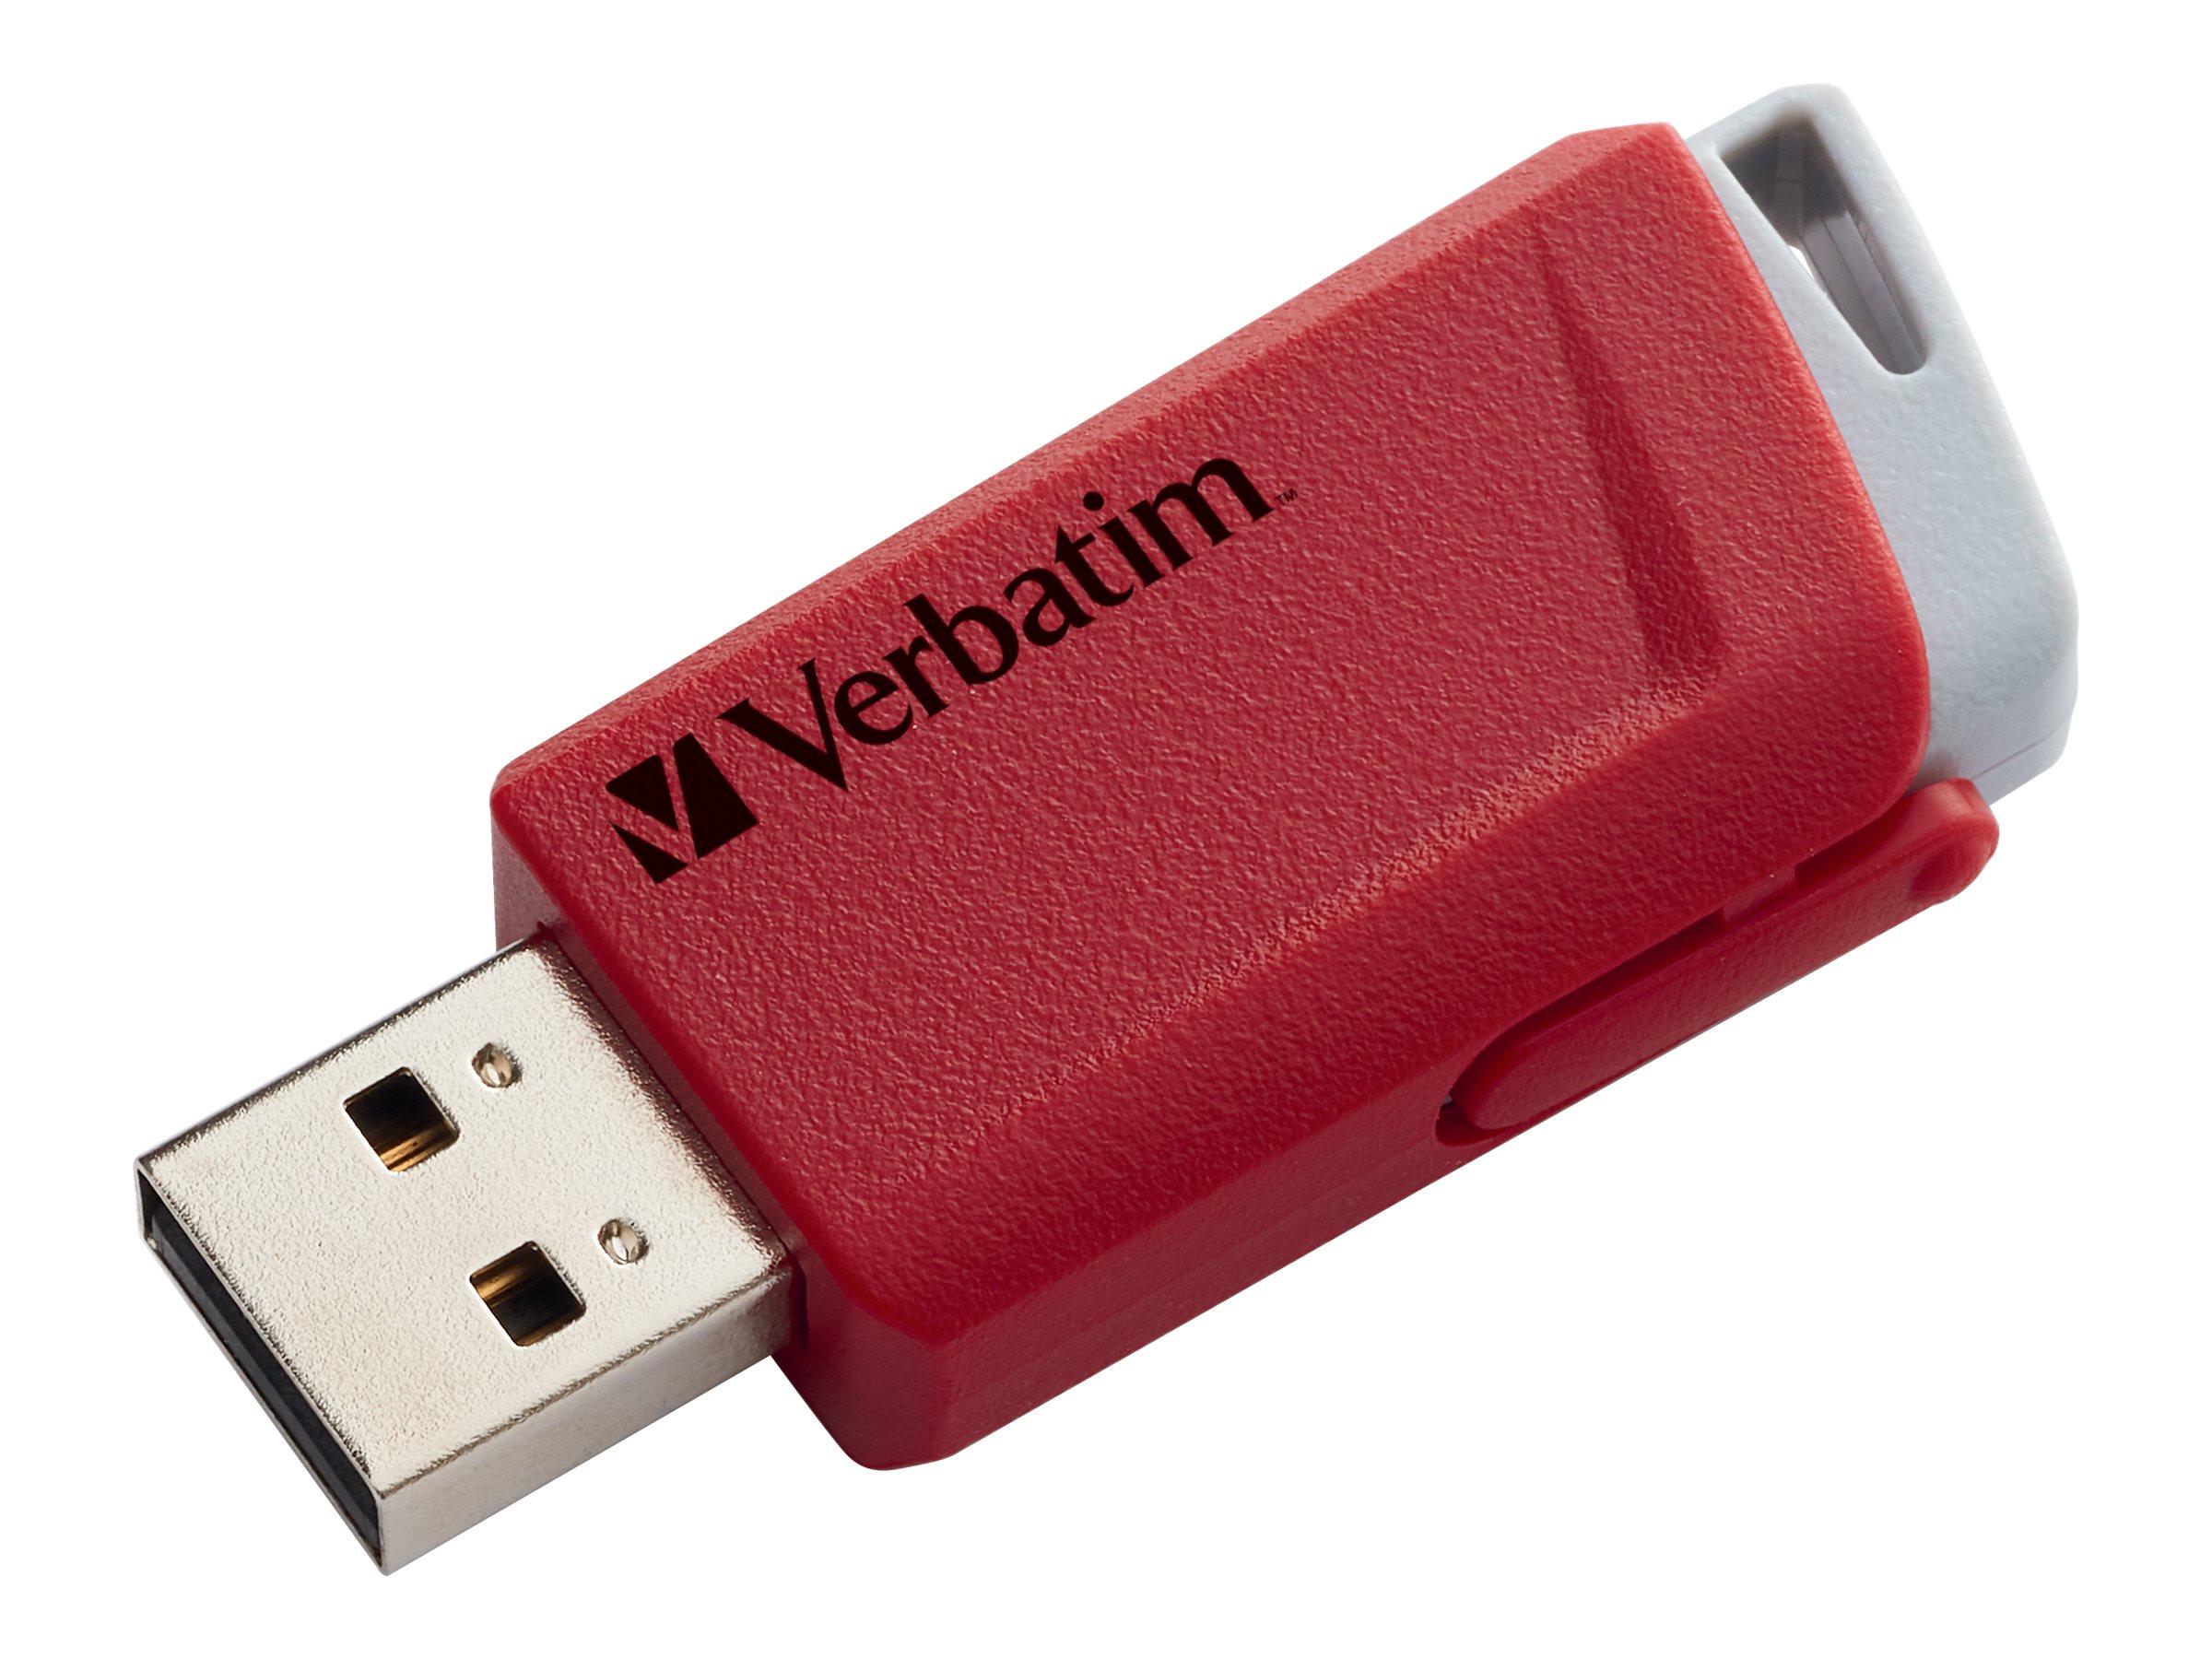 Verbatim Store 'n' Click - USB-Flash-Laufwerk - 16 GB - USB 3.2 Gen 1 - Blau, Gelb, Rot (Packung mit 3)